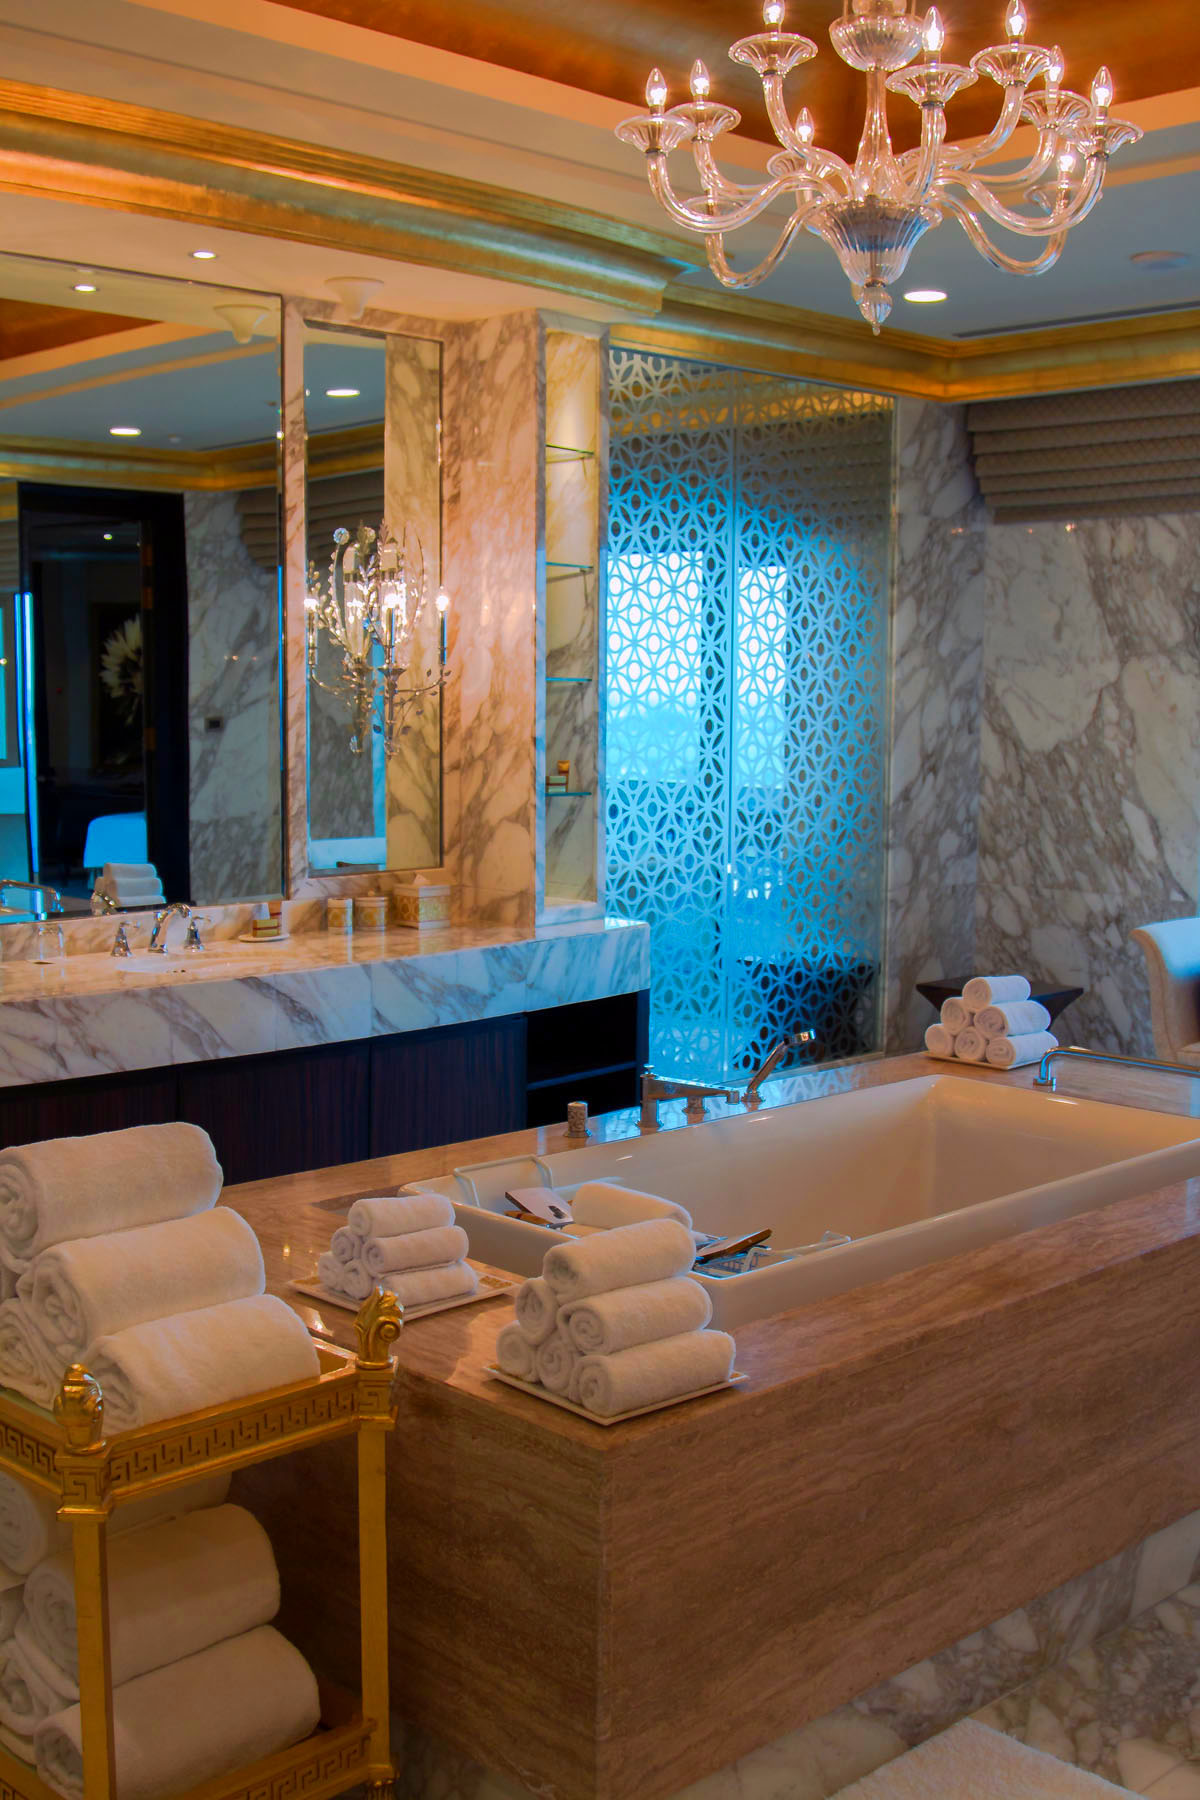 INDIEN_ITC_Grand_Chola_Hotel_Chennai_FINEST-onTour_7073.jpg